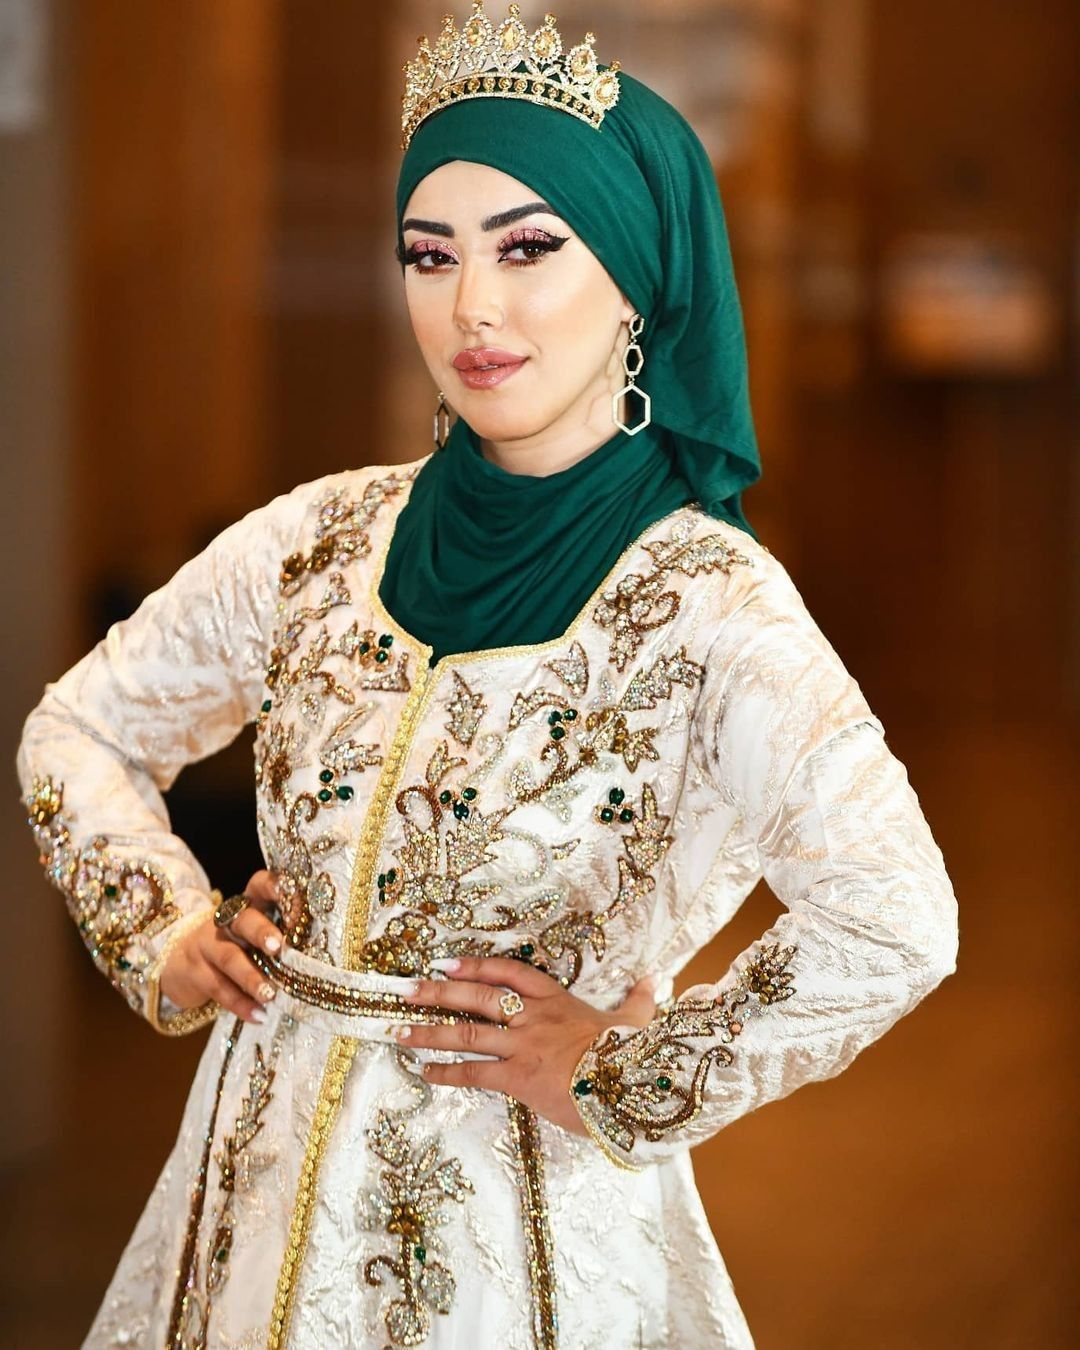 Dz Algerie Algerian Tourismalgeria Dahk Cheddatlemcenia Bejaia Jijel Batna Dzpower Mt Dz الحلويات الجزائرية المطبخ الجزائري In 2021 Fashion Hijab